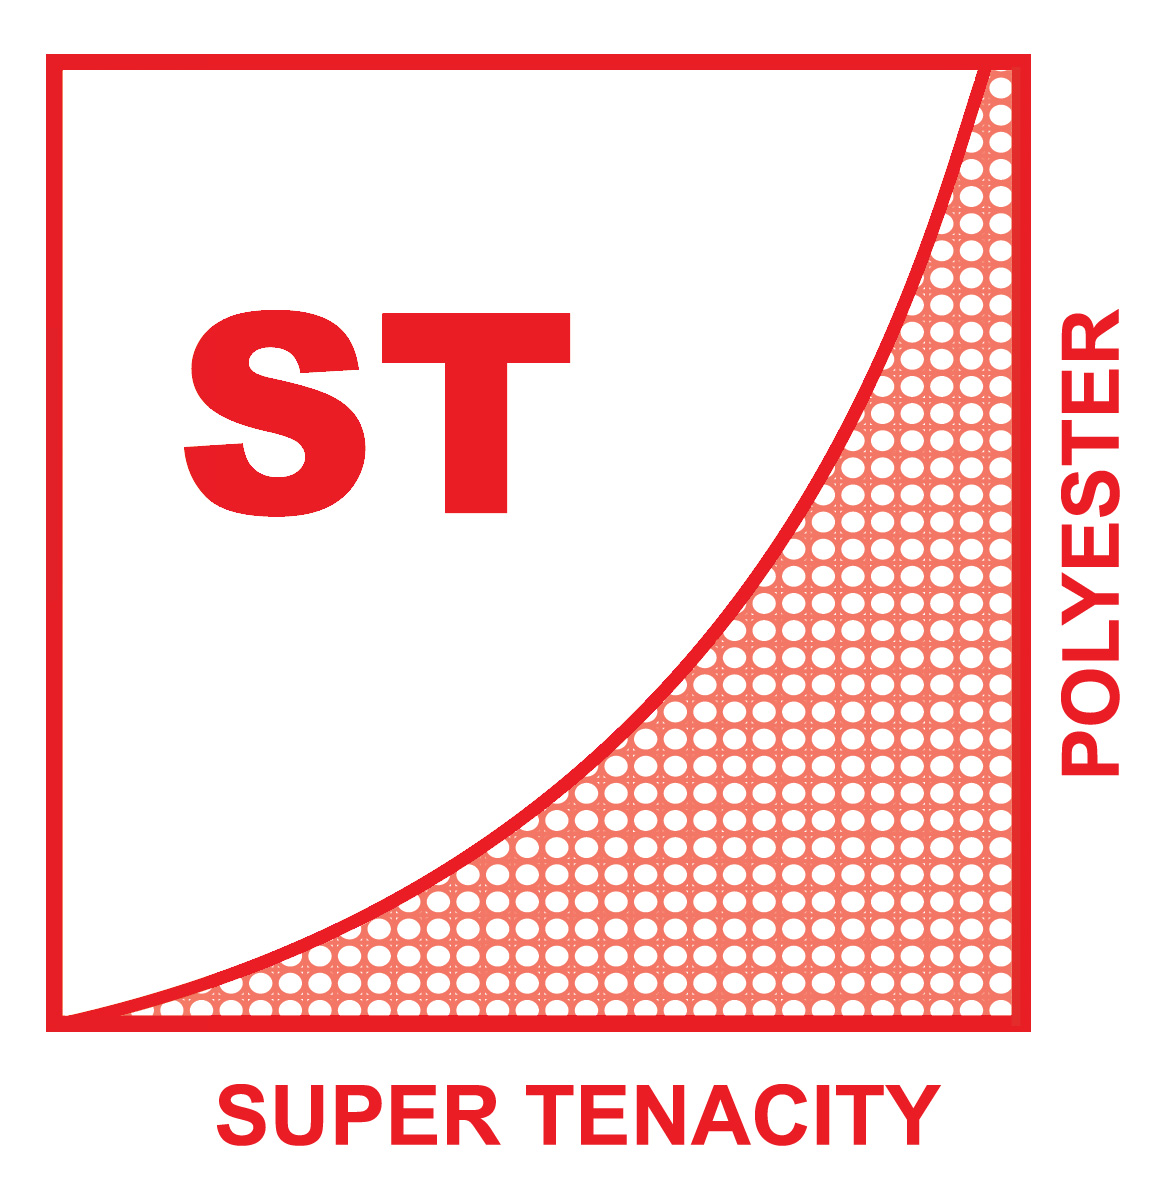 SuperTenacity-02.jpg